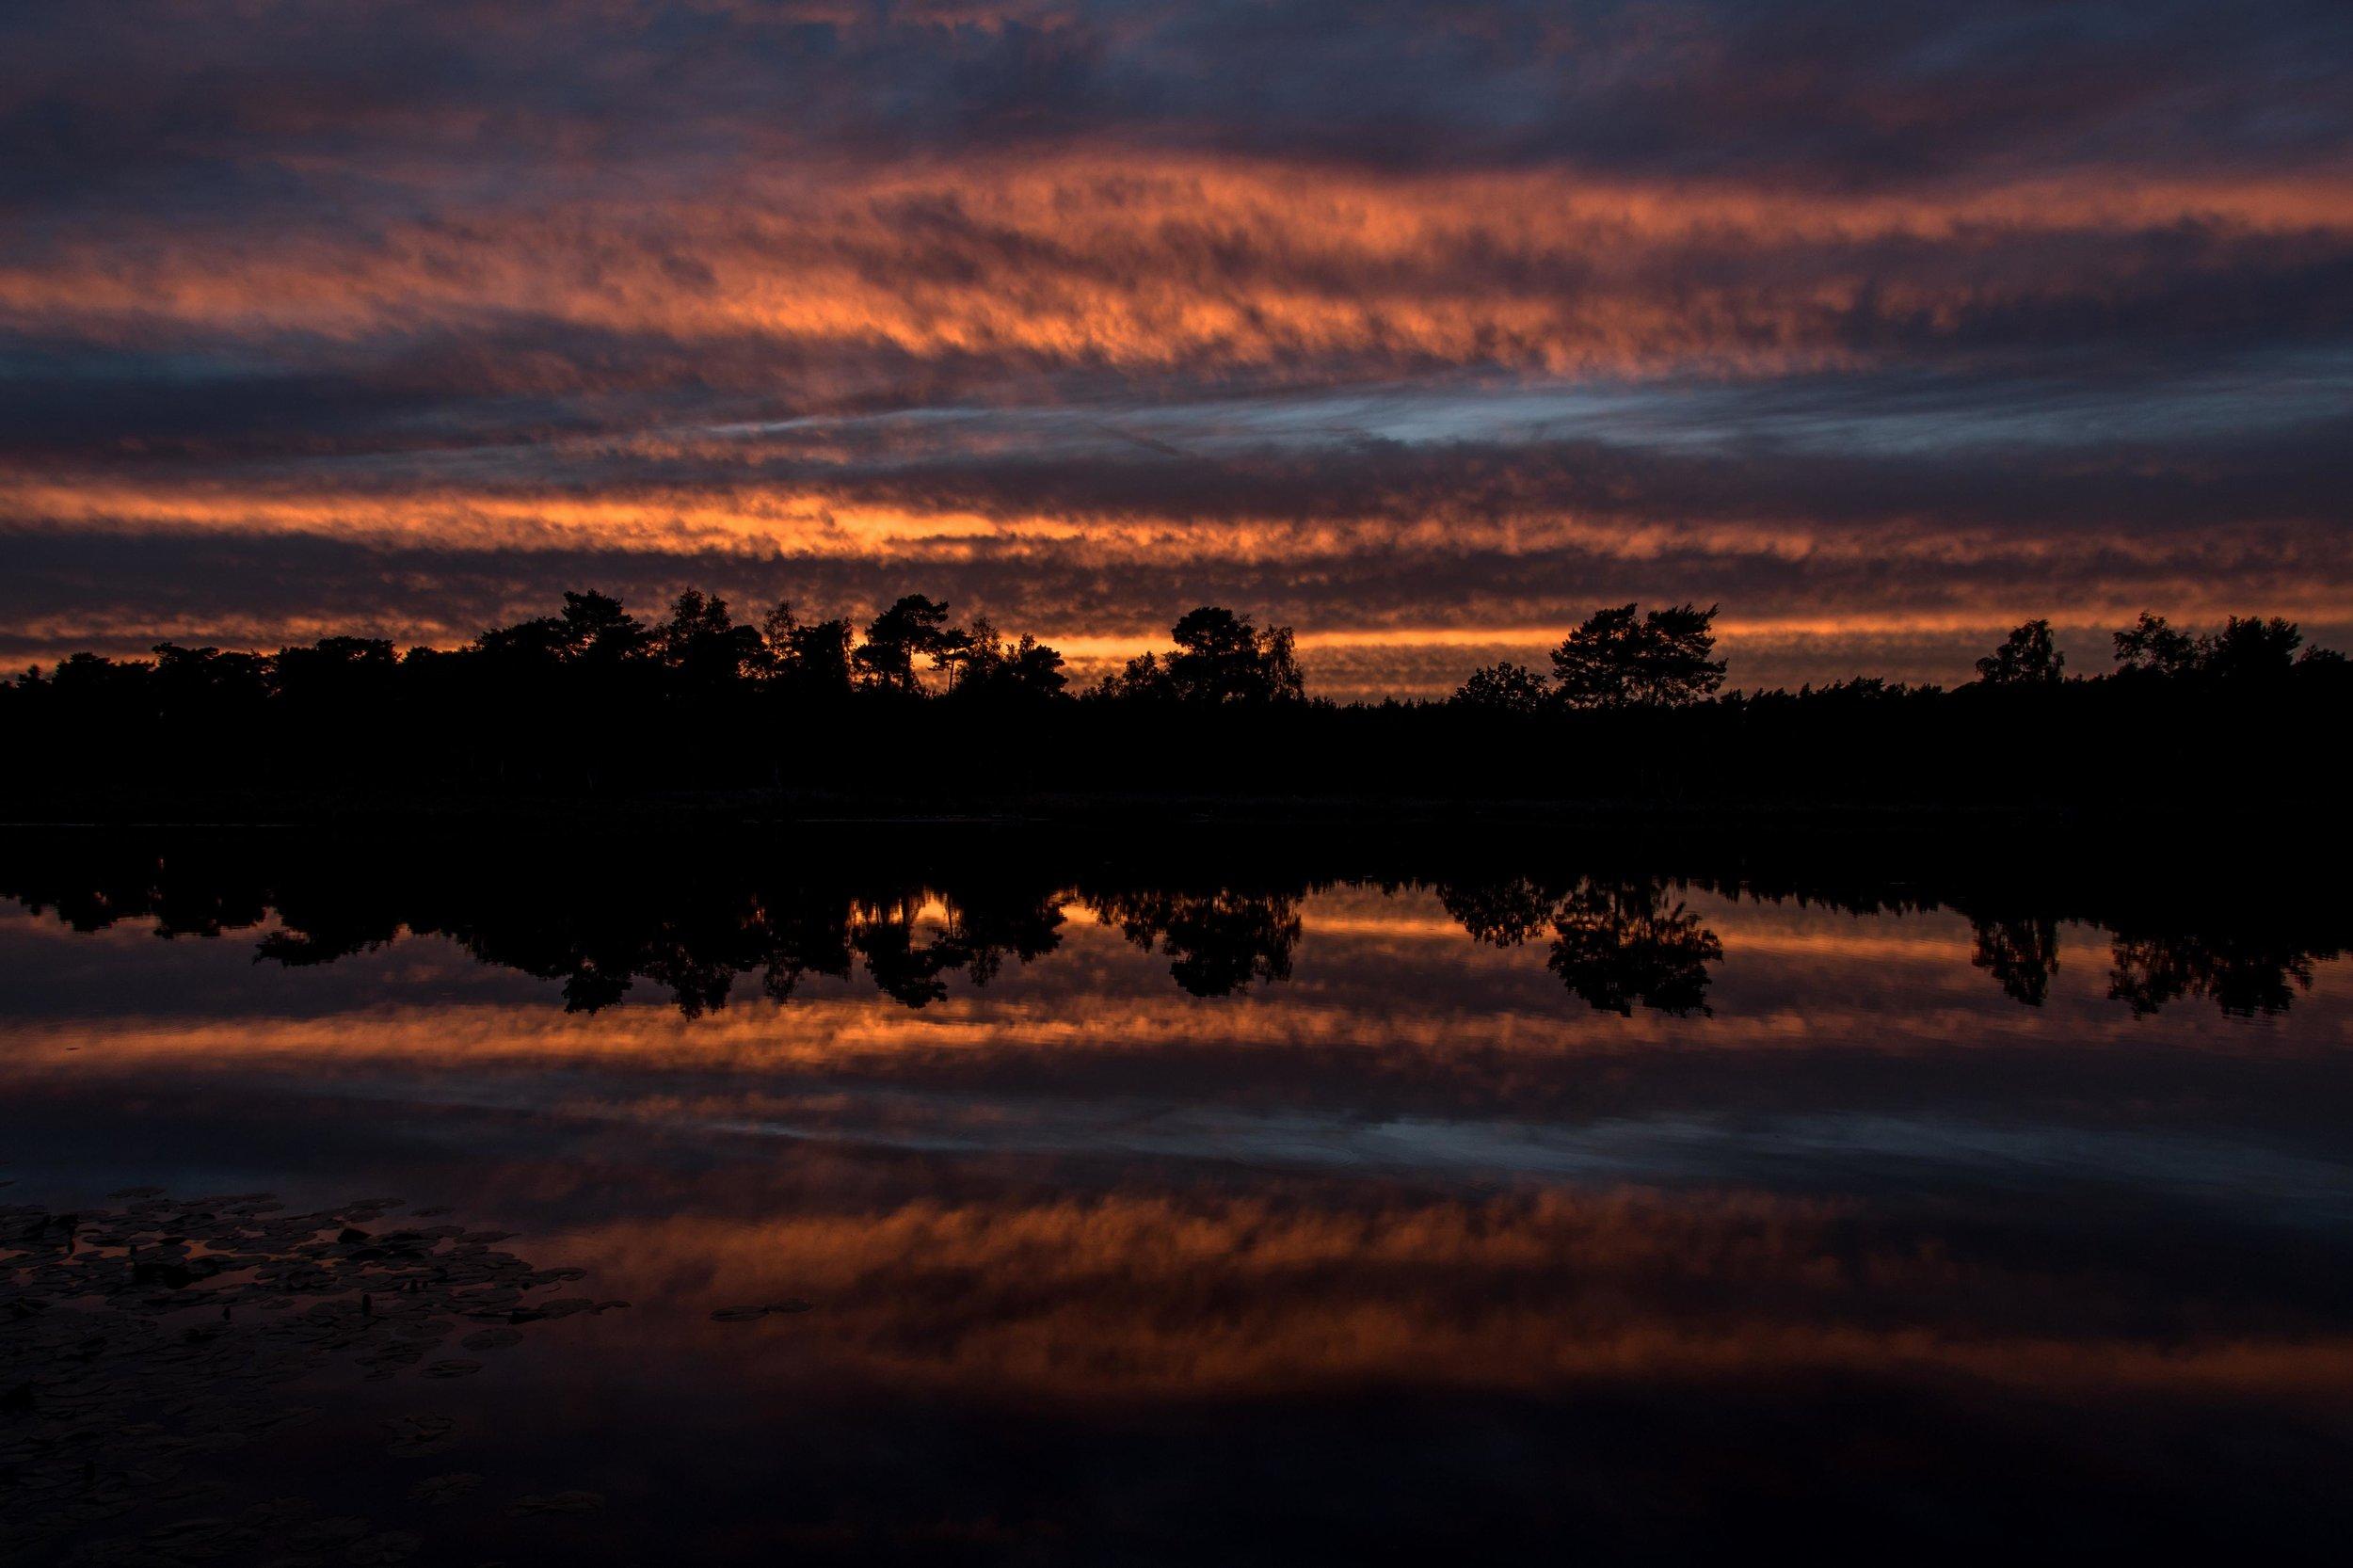 Sunset on the Beegderheide.